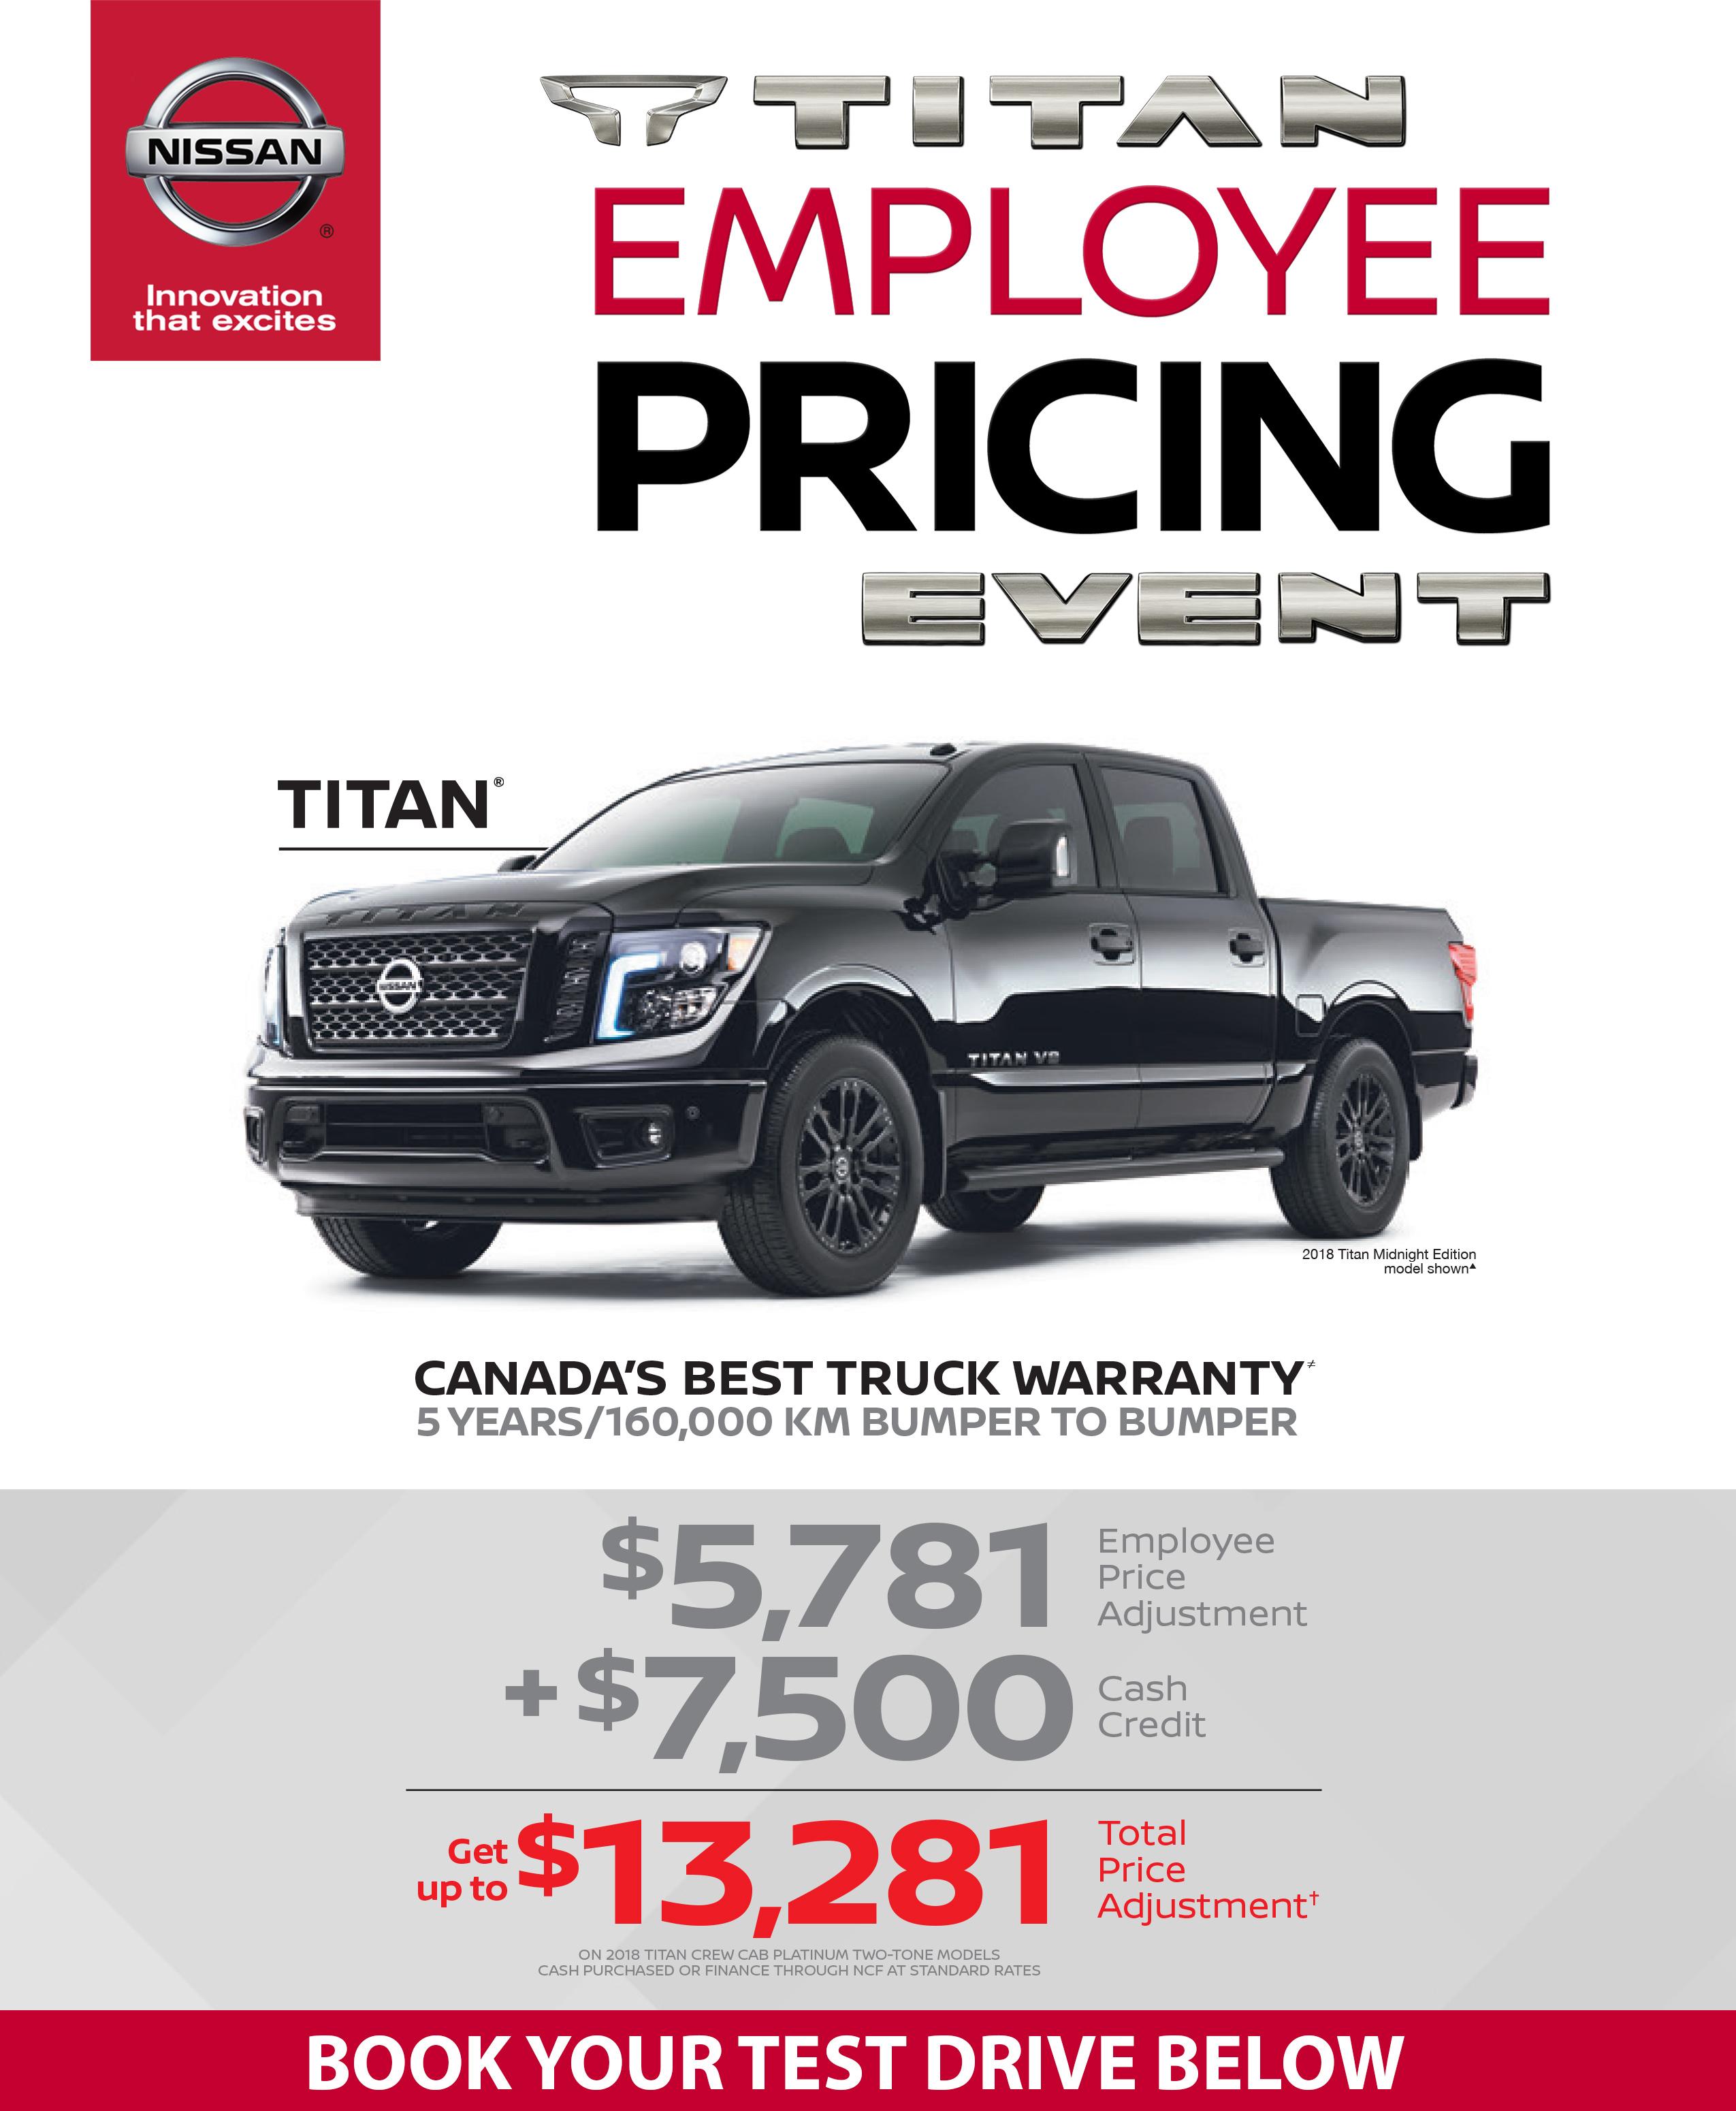 Titan Employee Pricing